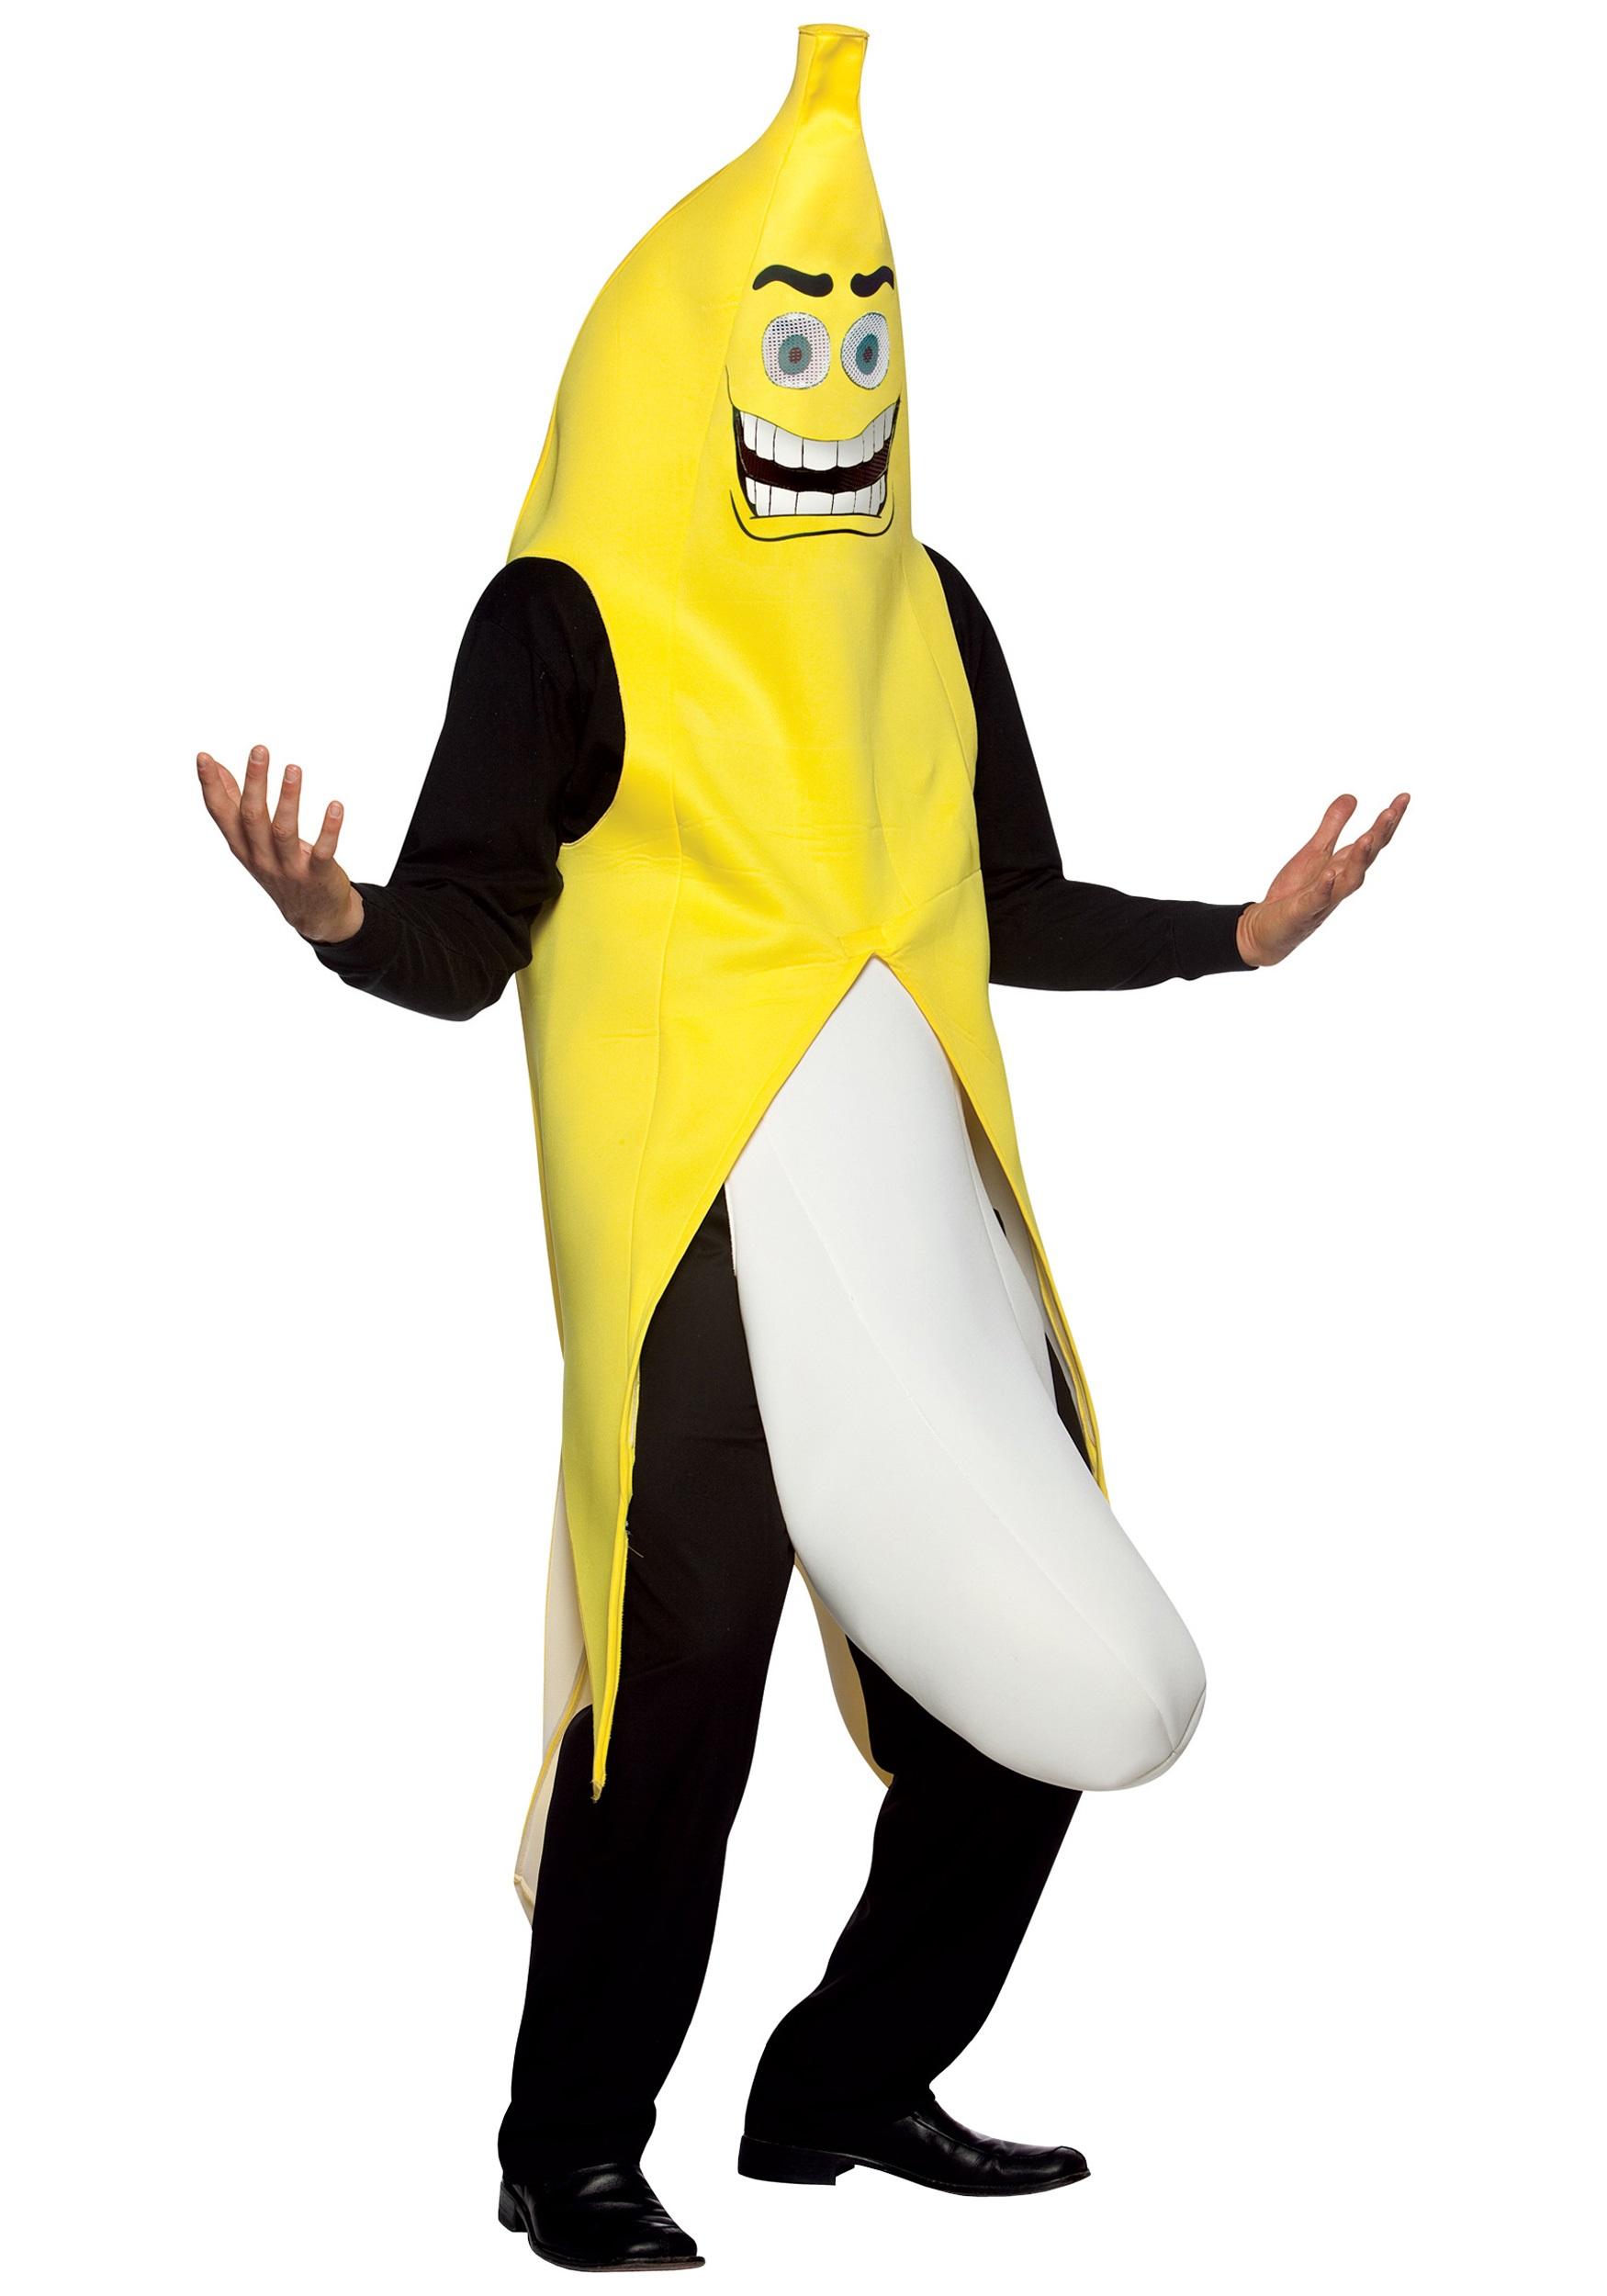 Banana Flasher Costume  sc 1 st  Halloween Costumes & Banana Flasher Costume - Halloween Costumes